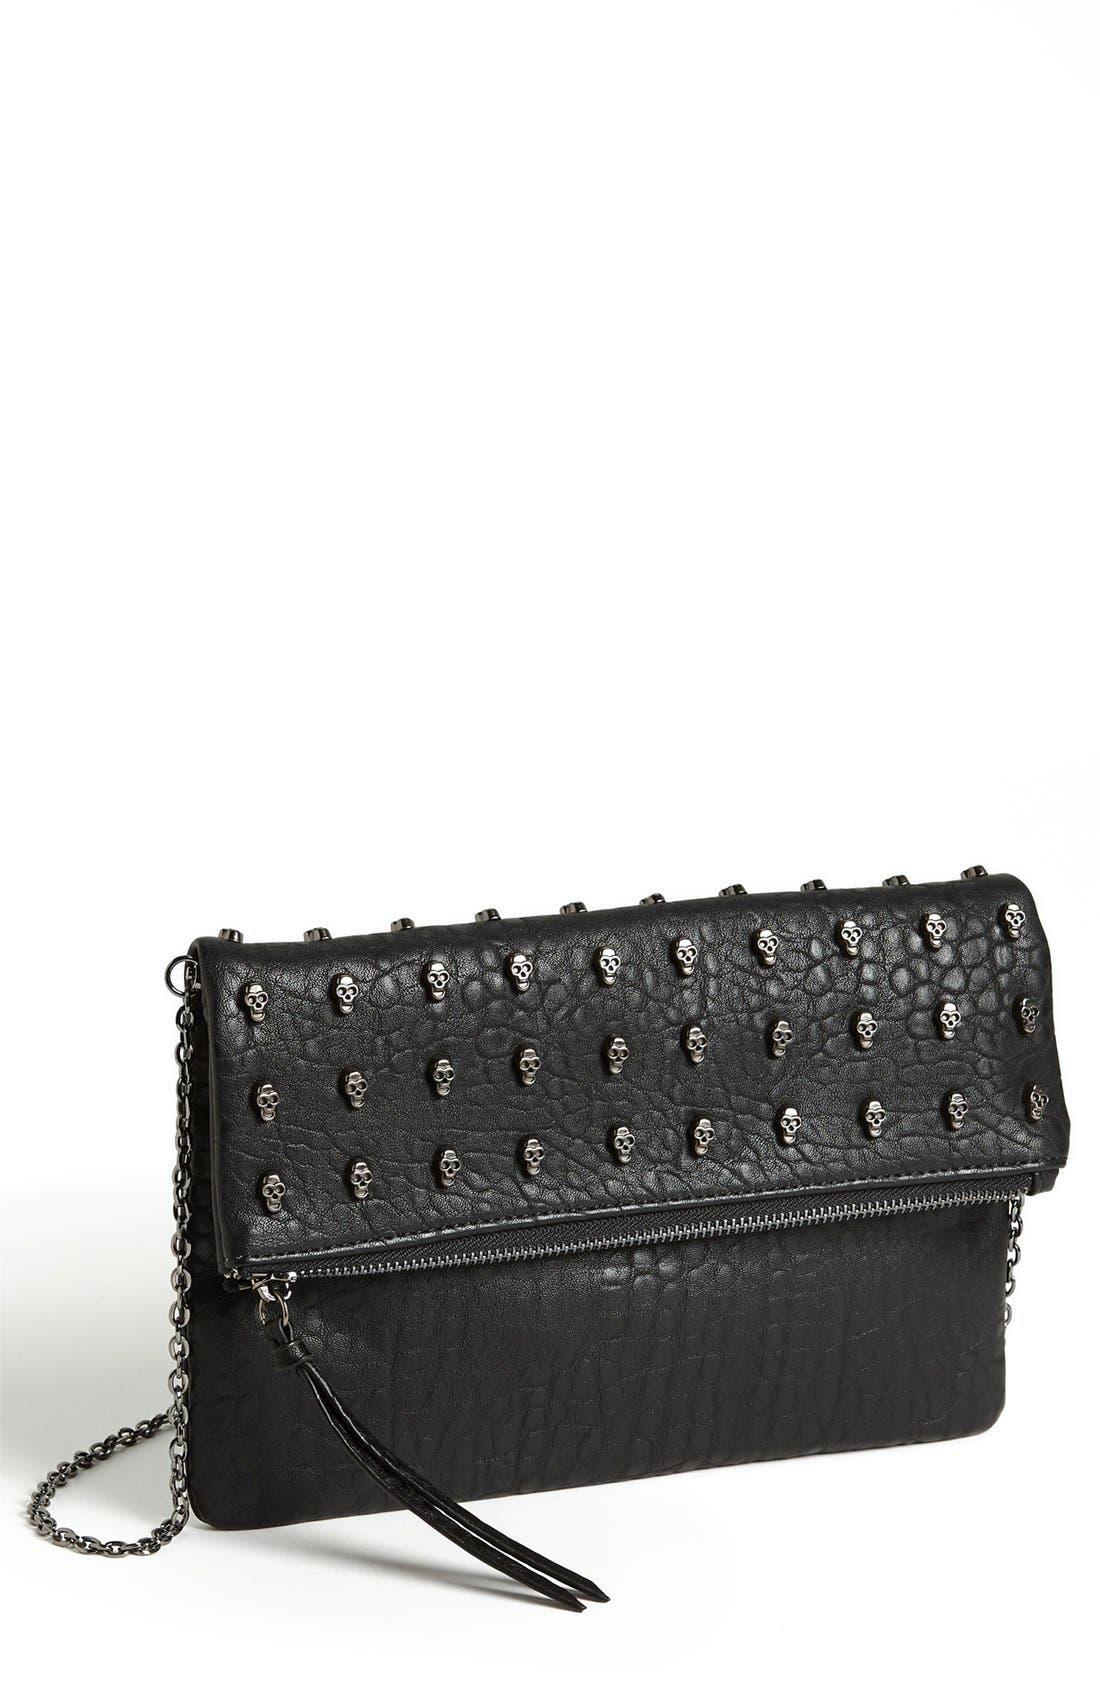 Alternate Image 1 Selected - Urban Expressions Handbags 'Jam' Clutch